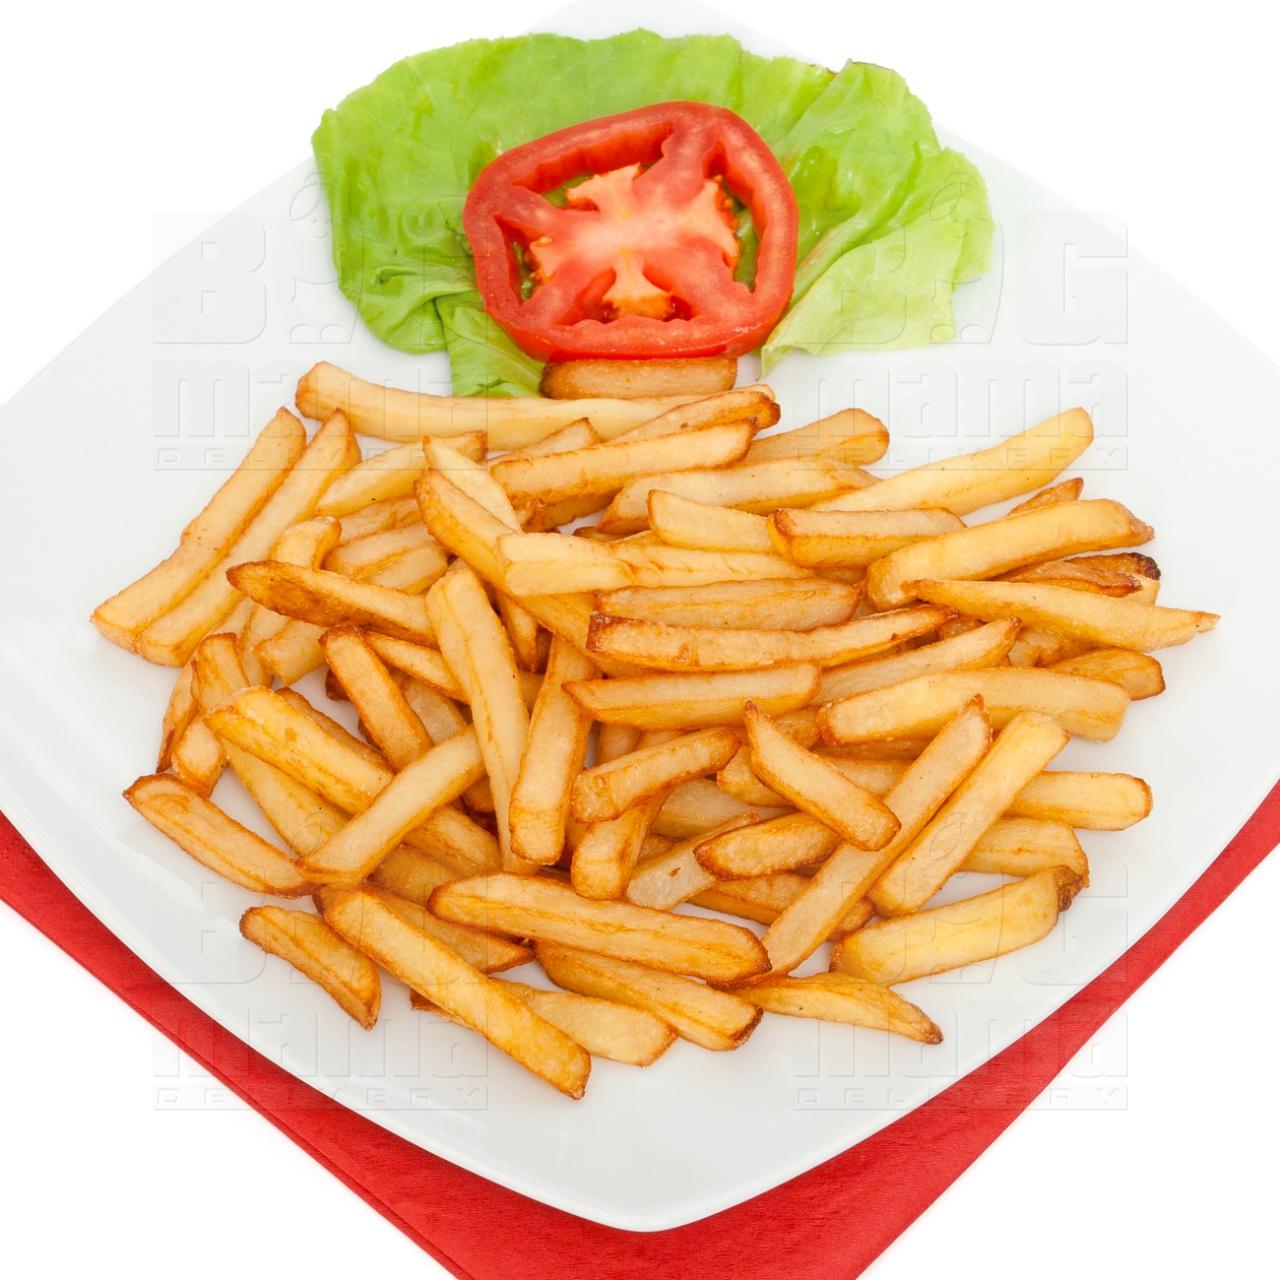 Product #34 image - Cartofi prăjiți